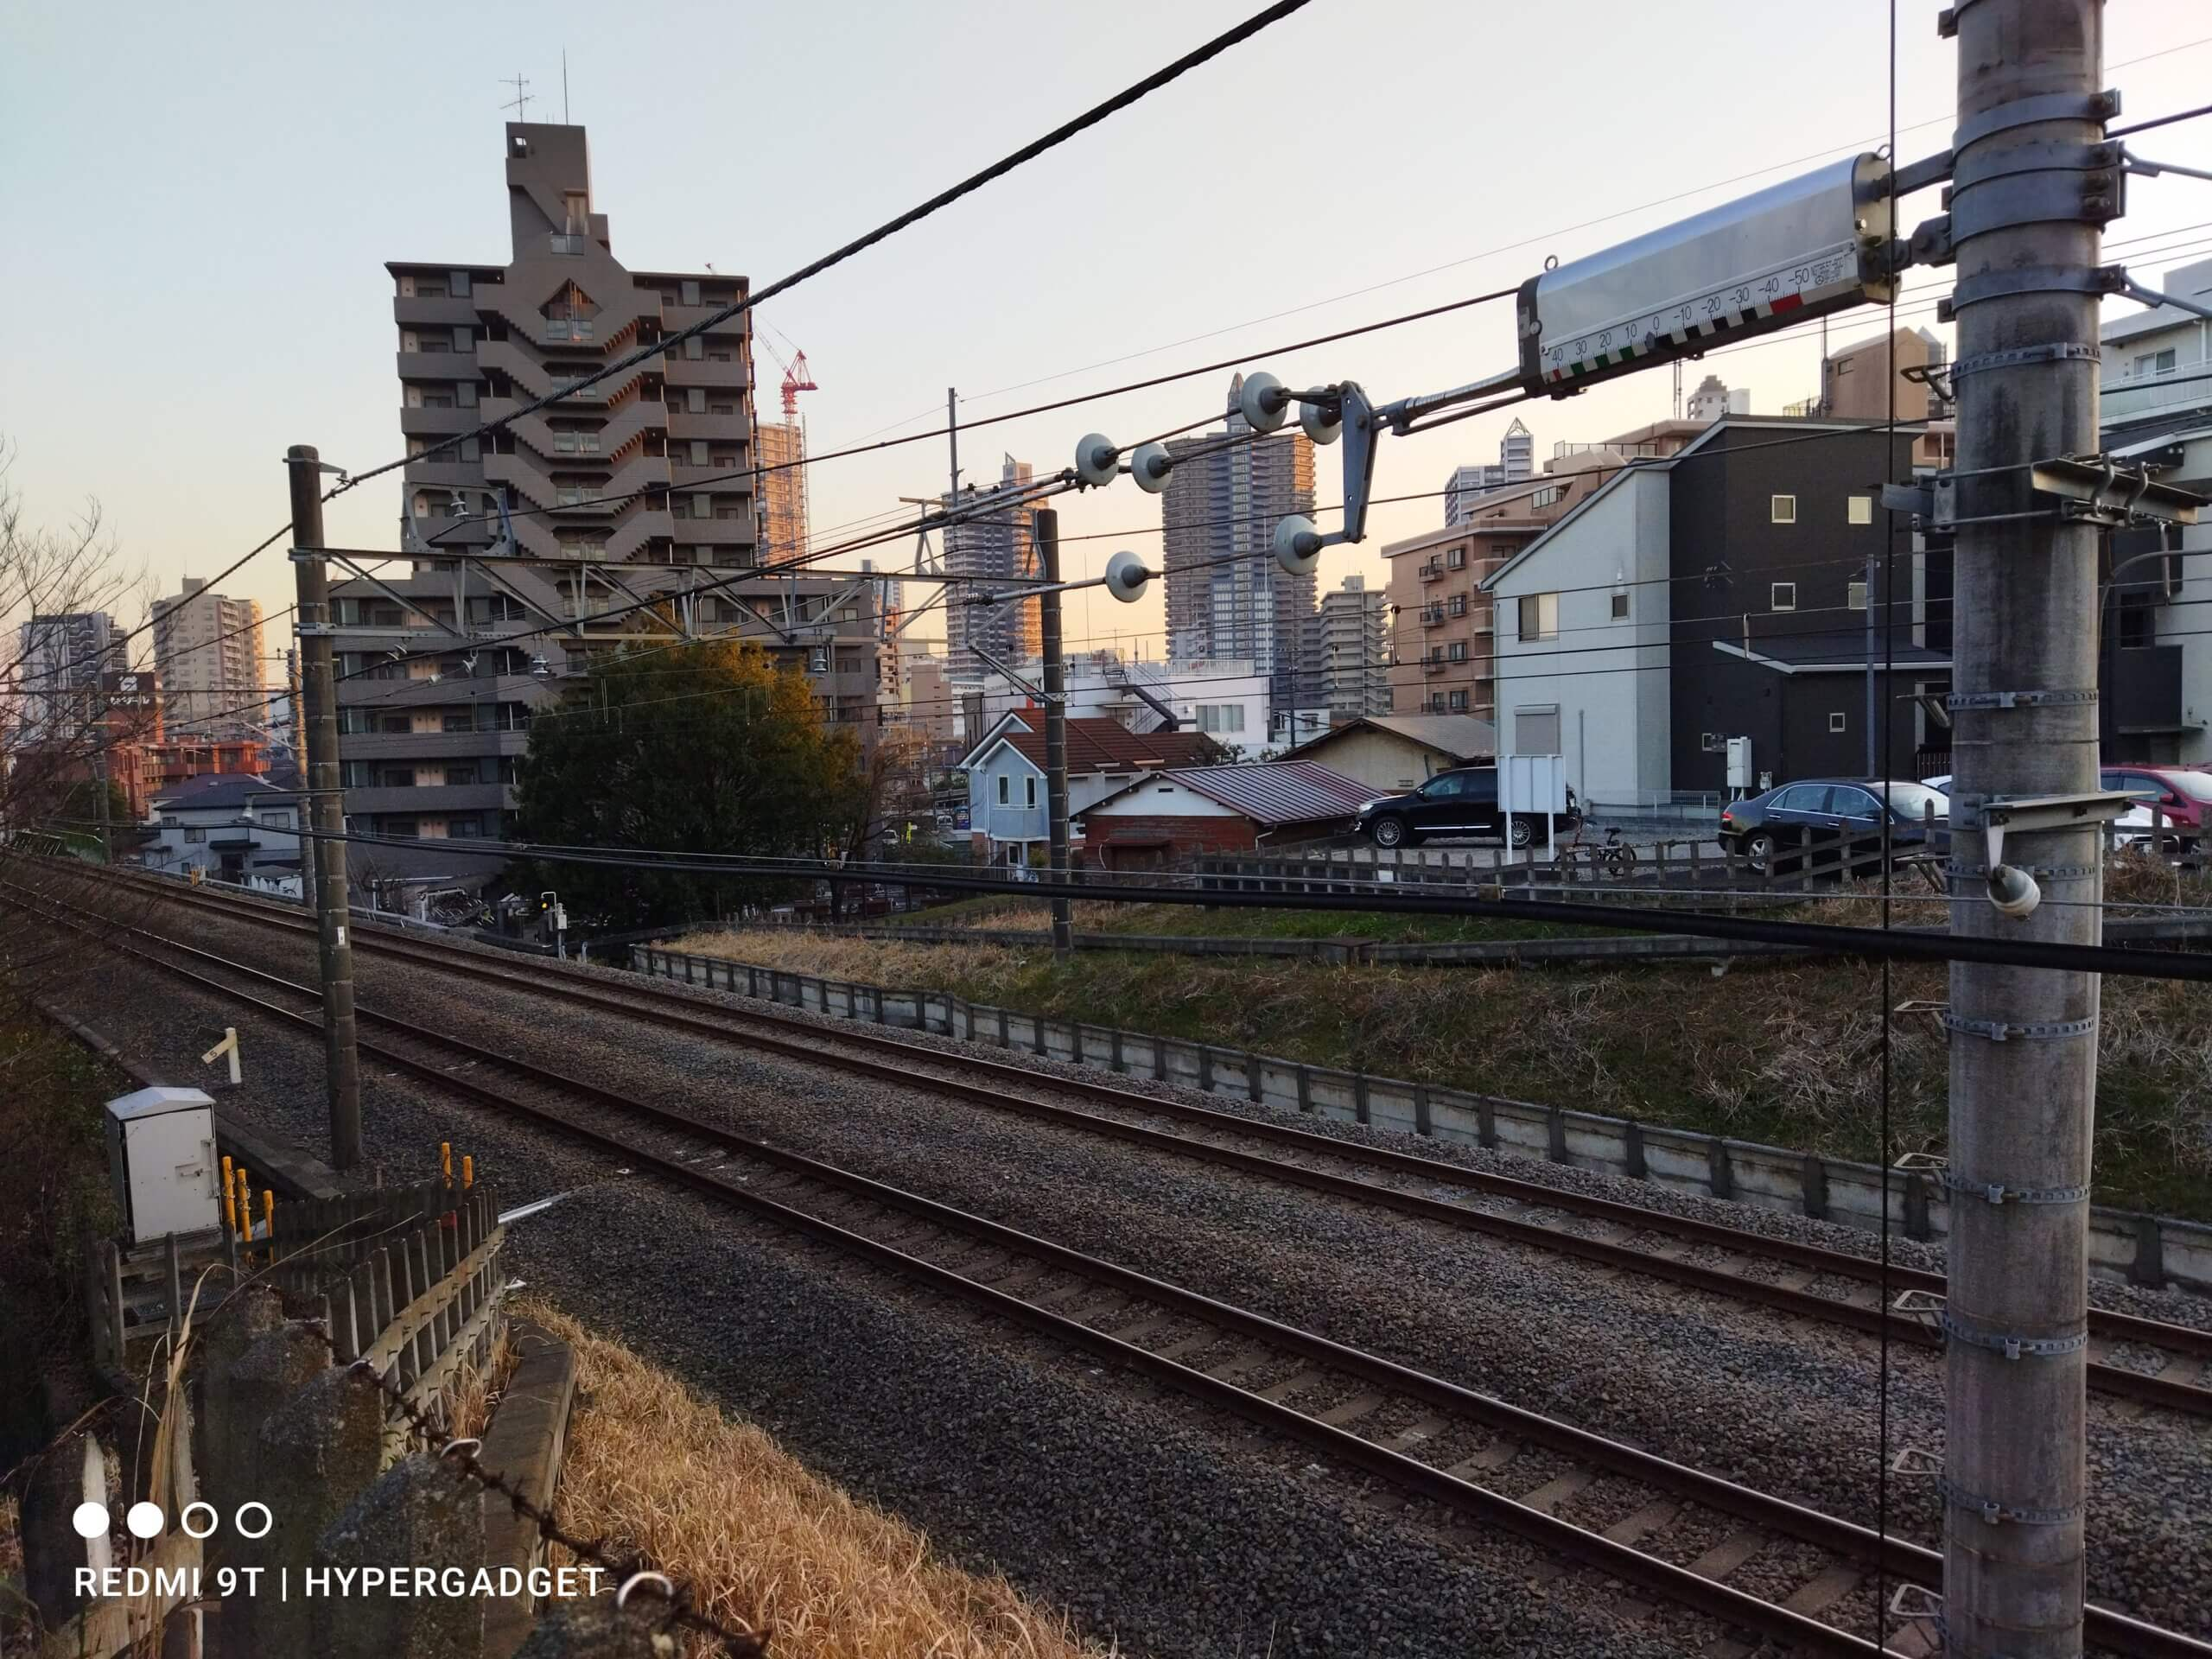 Xiaomi Redmi 9Tで撮影した鉄道と建物の写真